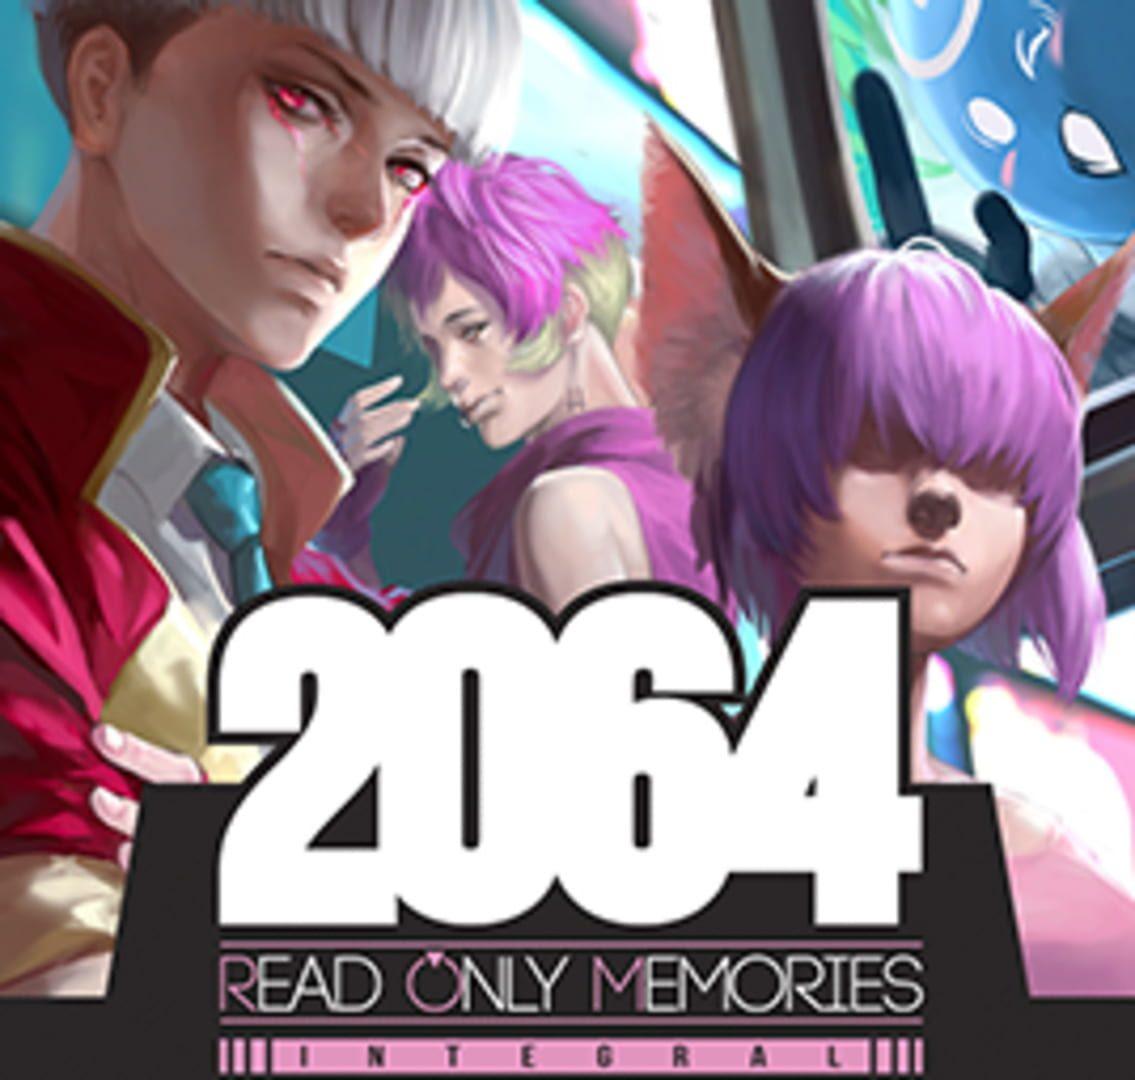 buy 2064: Read Only Memories INTEGRAL cd key for psn platform